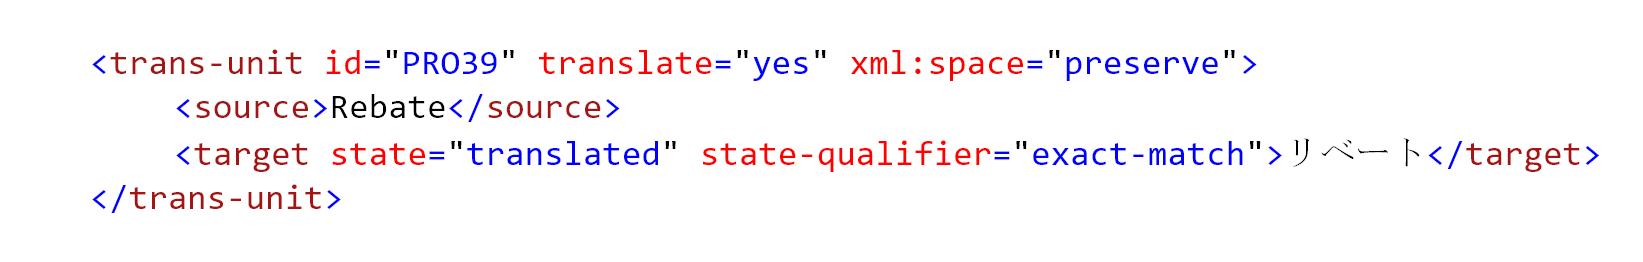 xliff translation unit